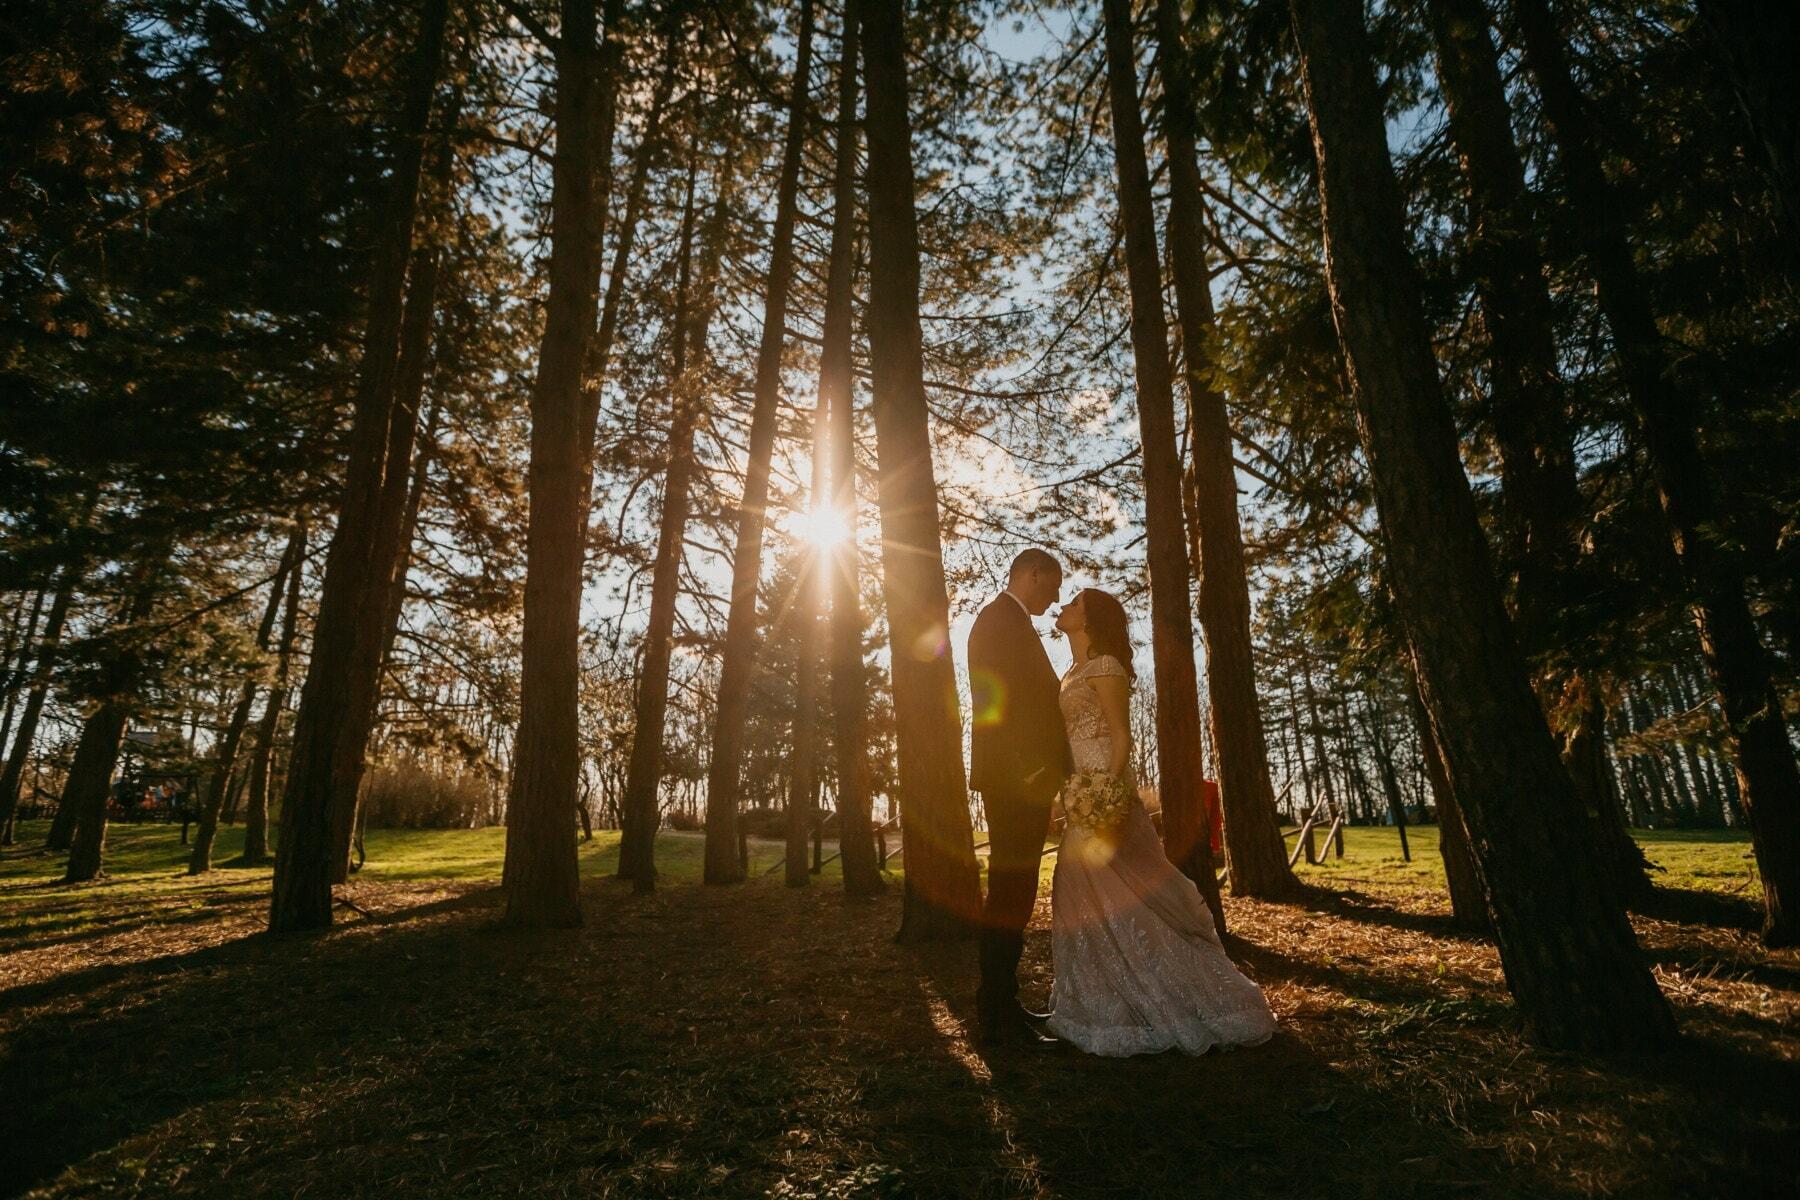 sunrise, groom, sunrays, bride, forest, morning, trees, dawn, tree, wedding